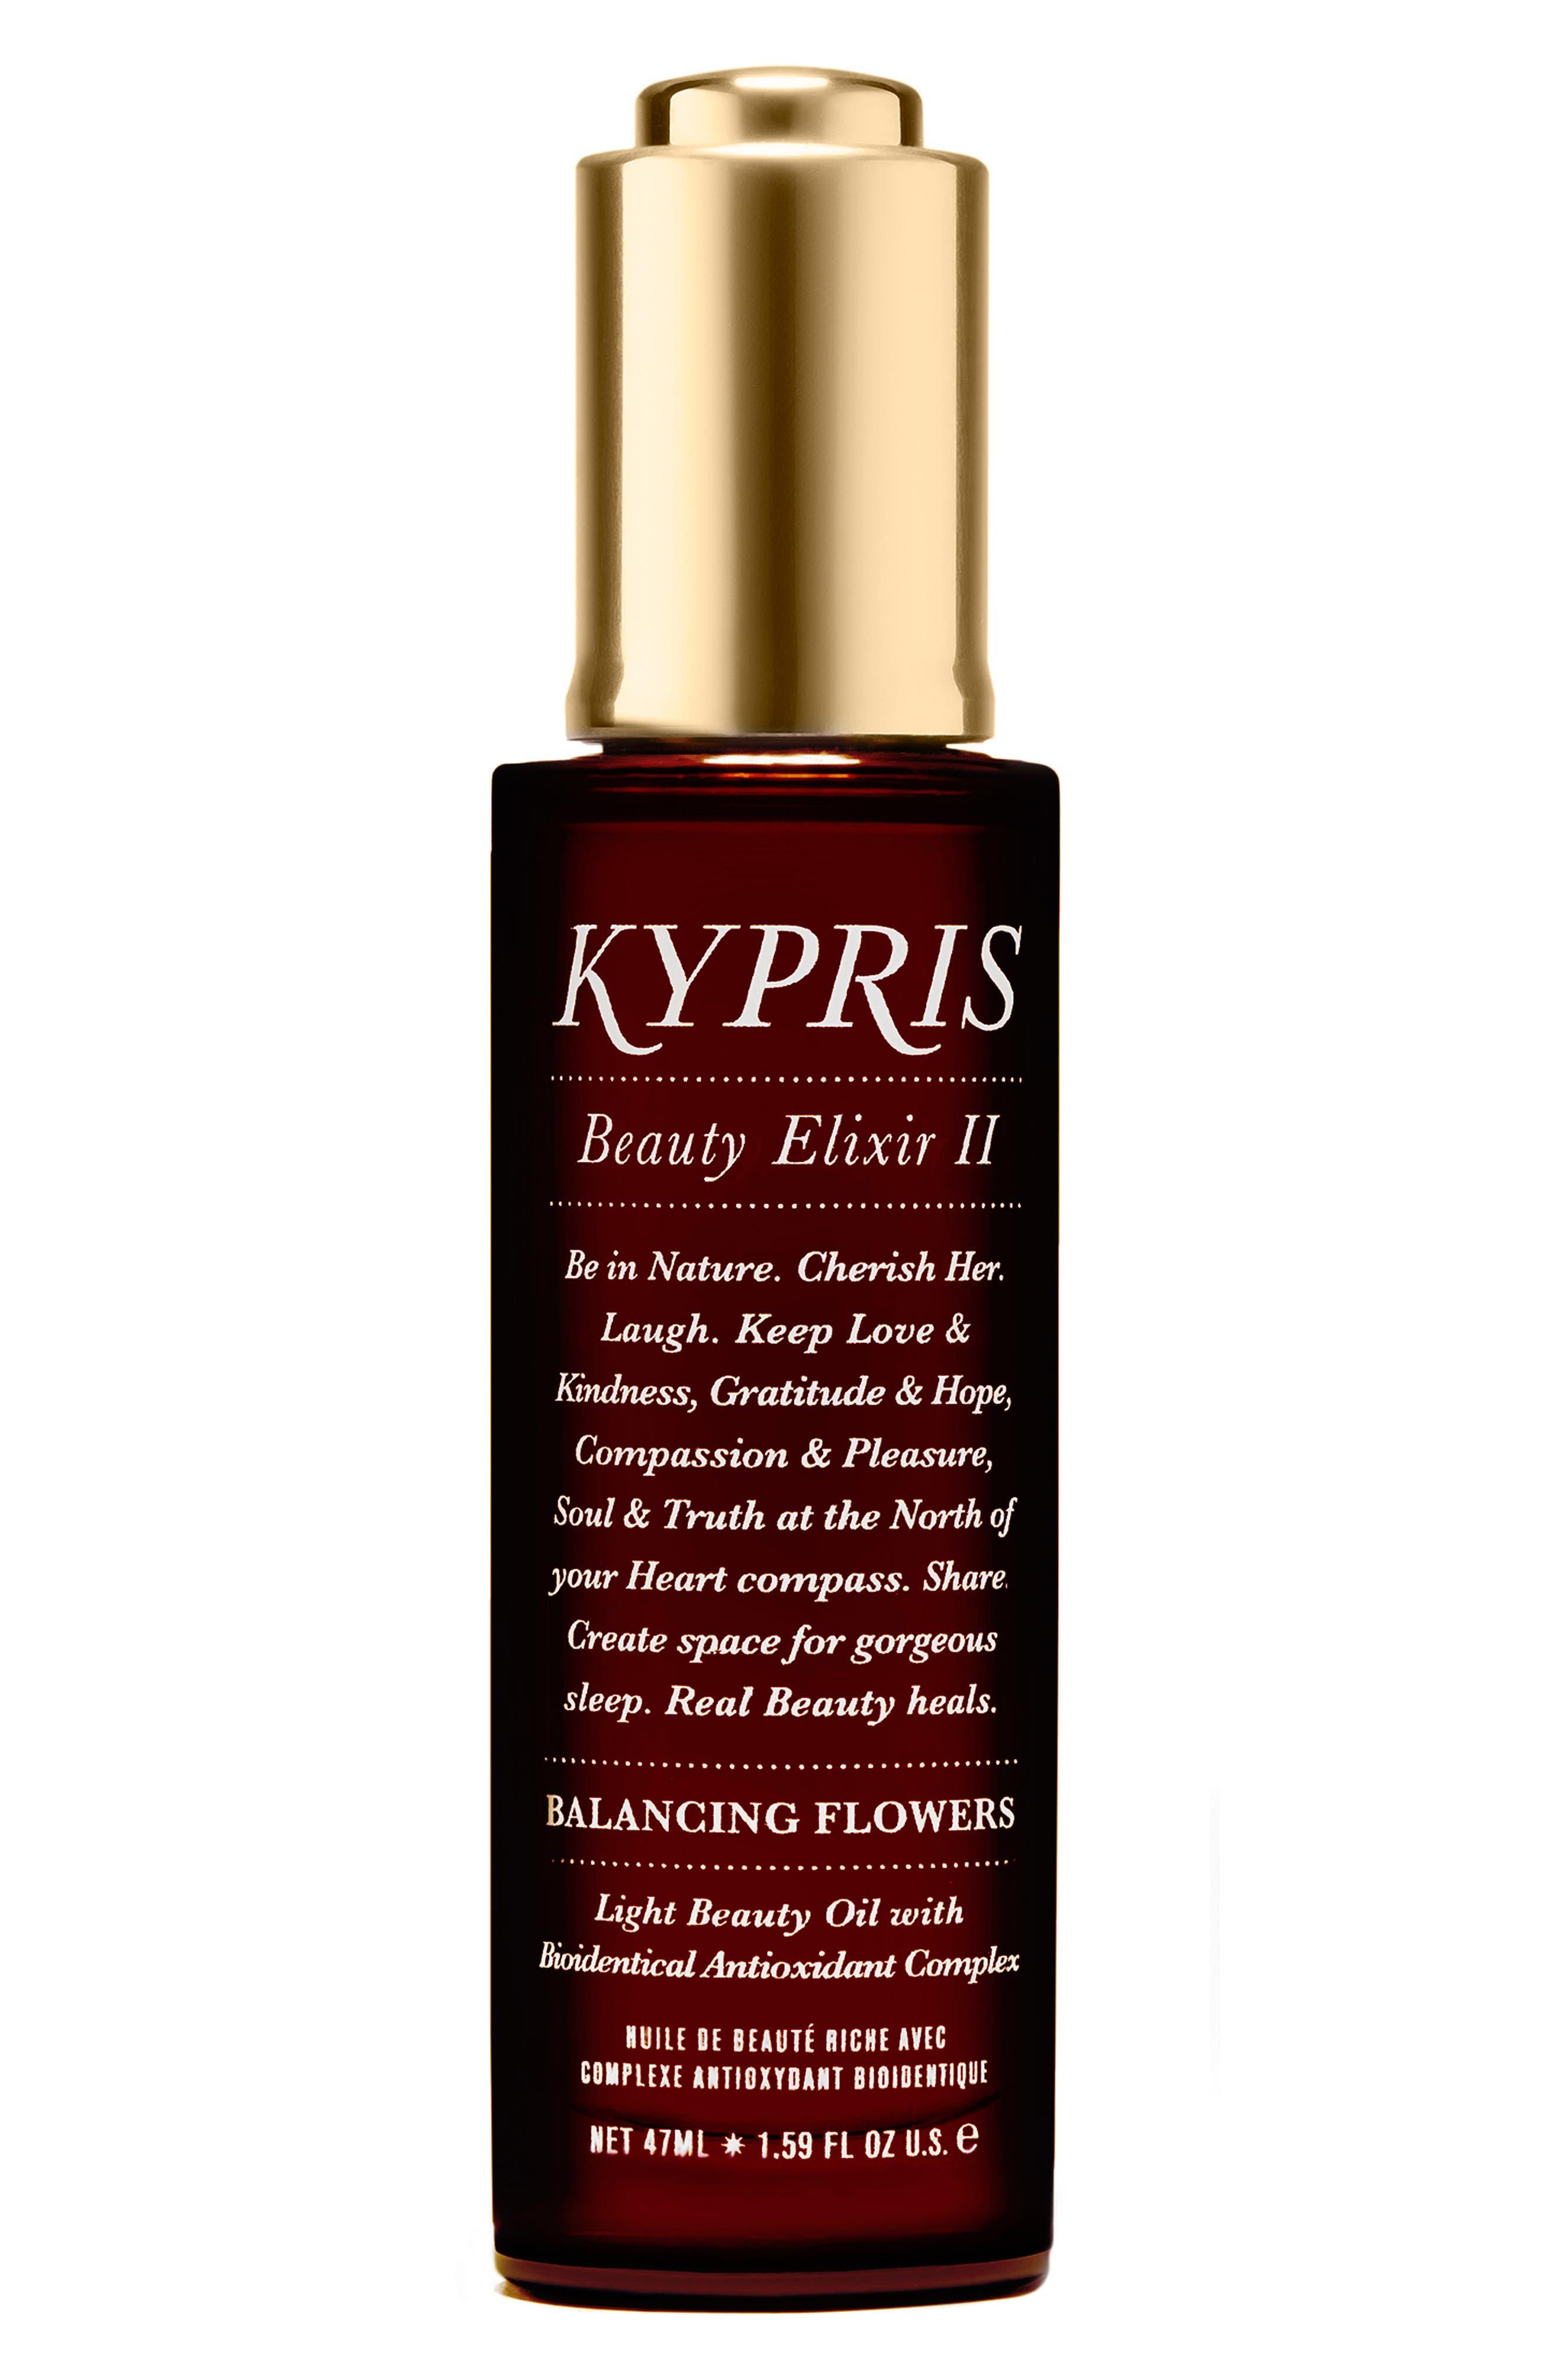 Beauty Elixir Ii: Balancing Flowers Moisturizing Face Oil